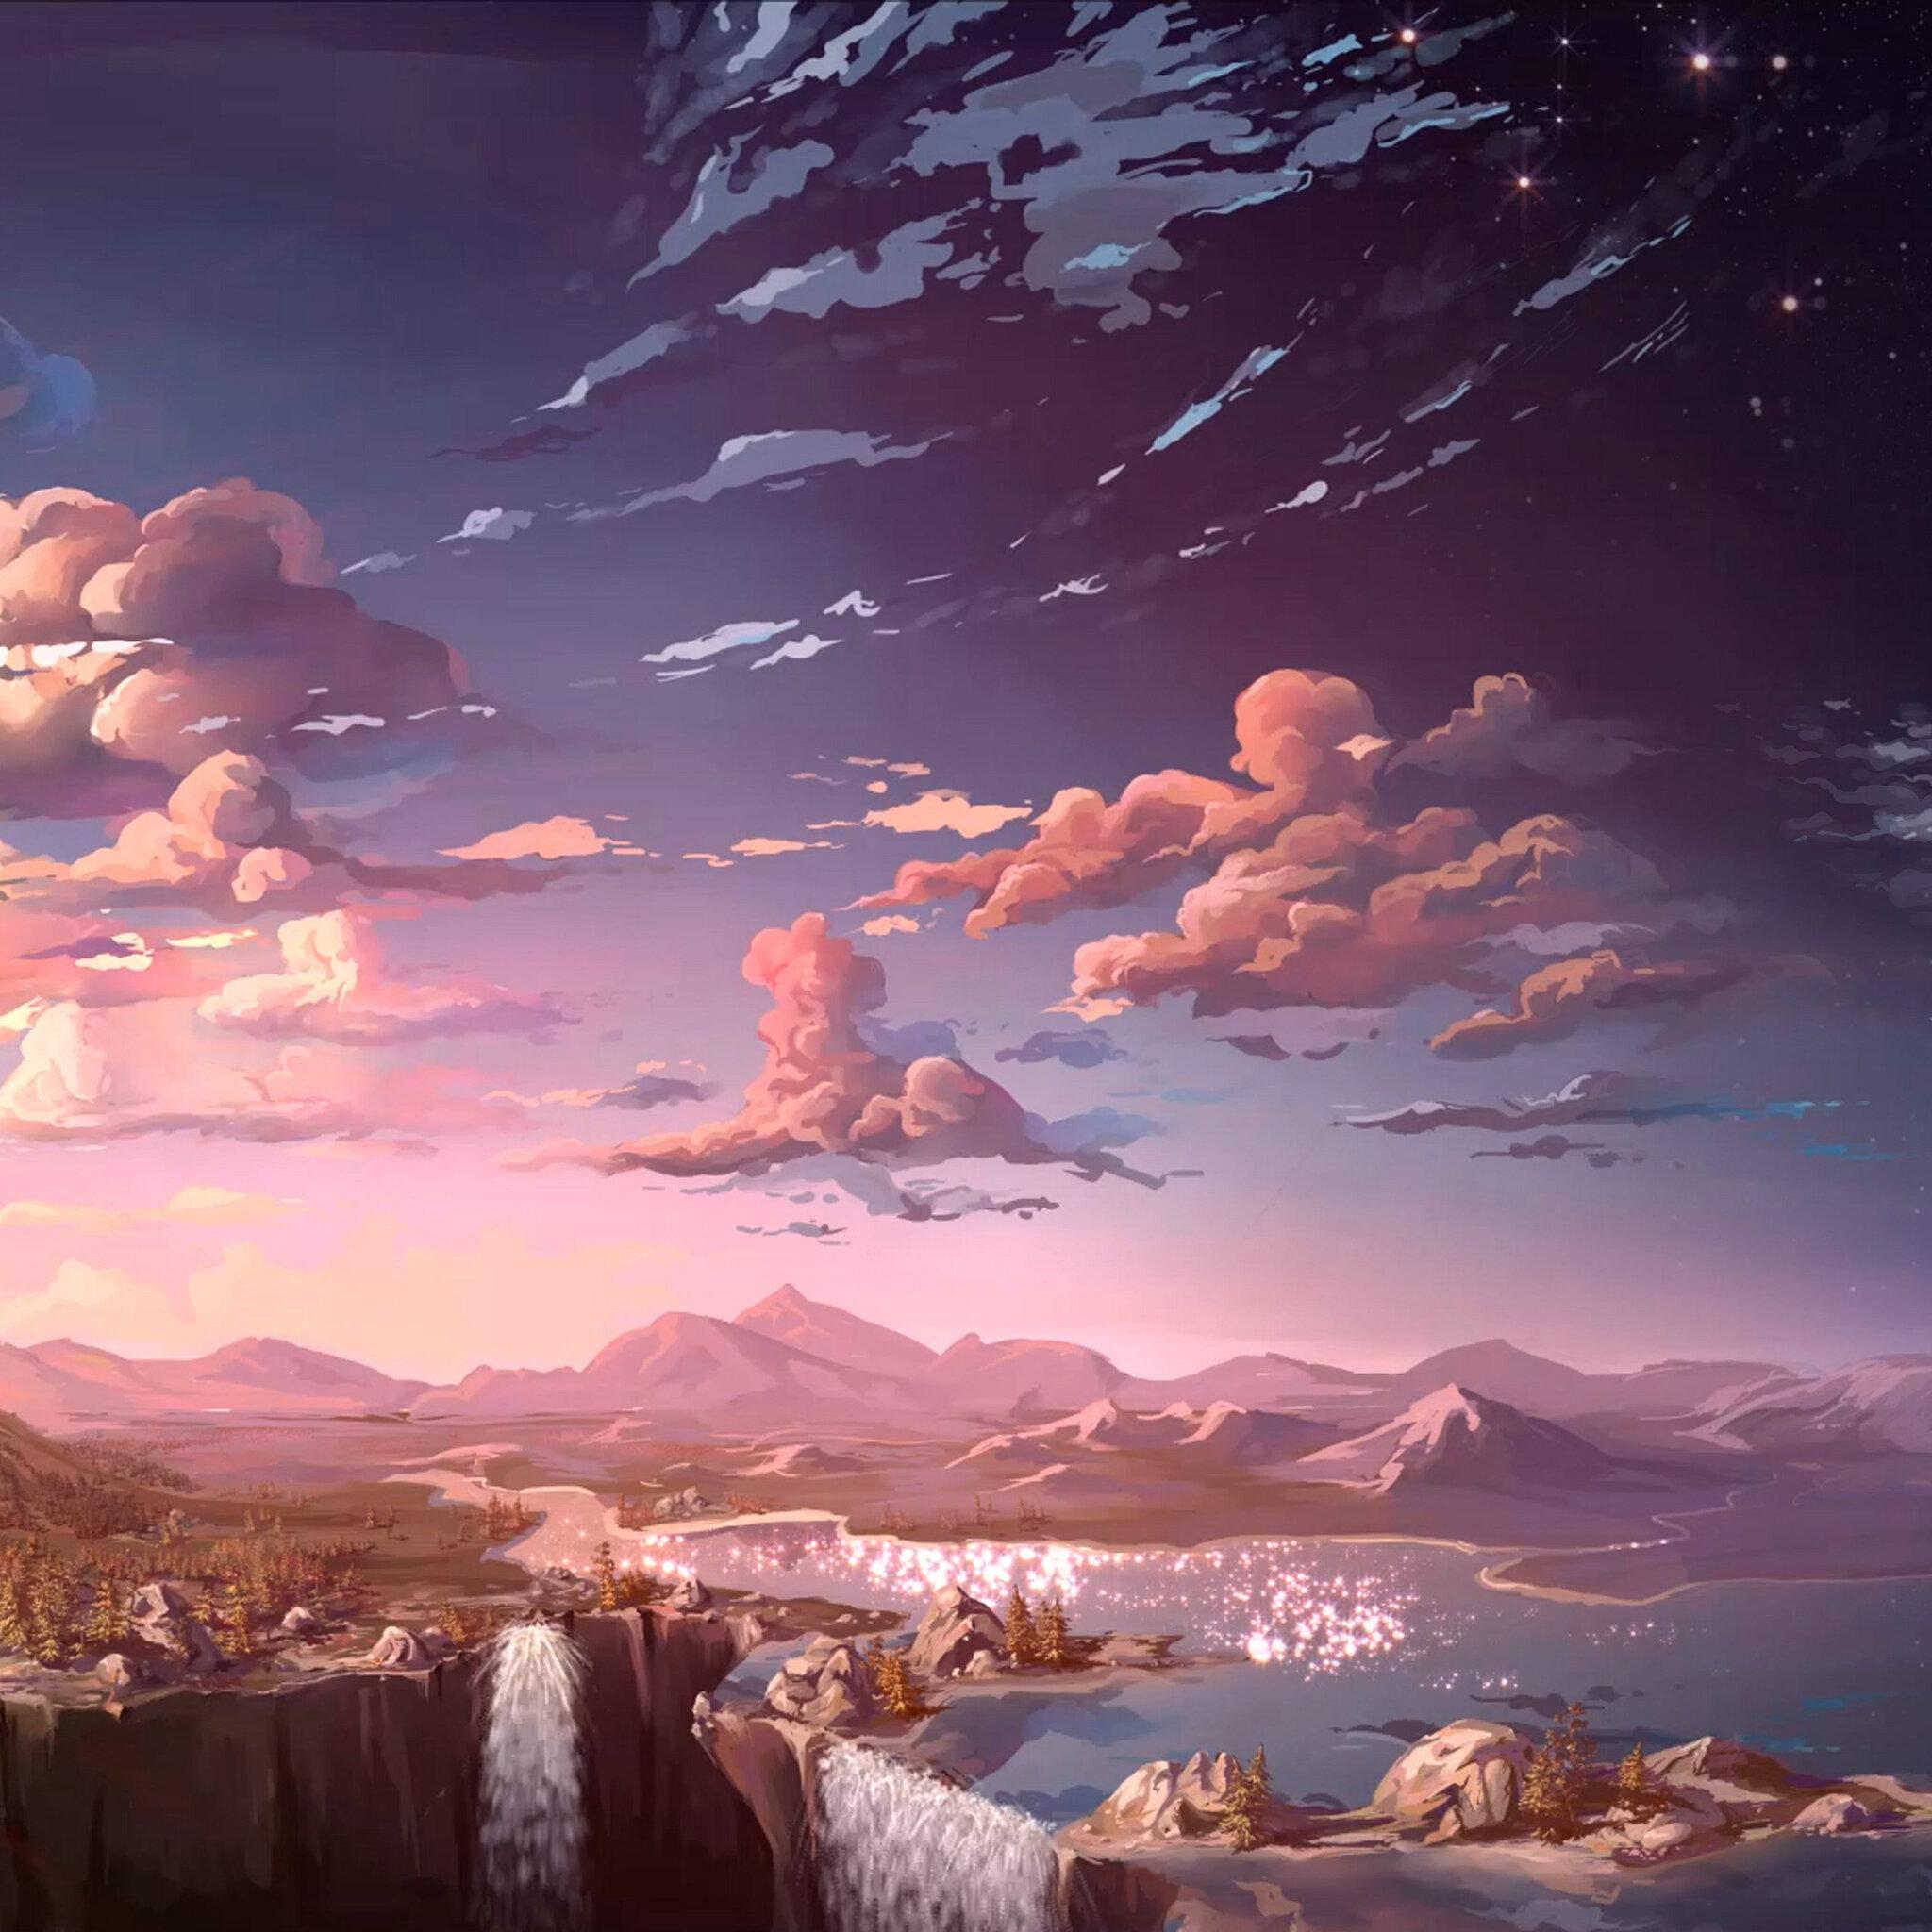 2048x2048 Anime Landscape Waterfall Cloud 5k Ipad Air HD